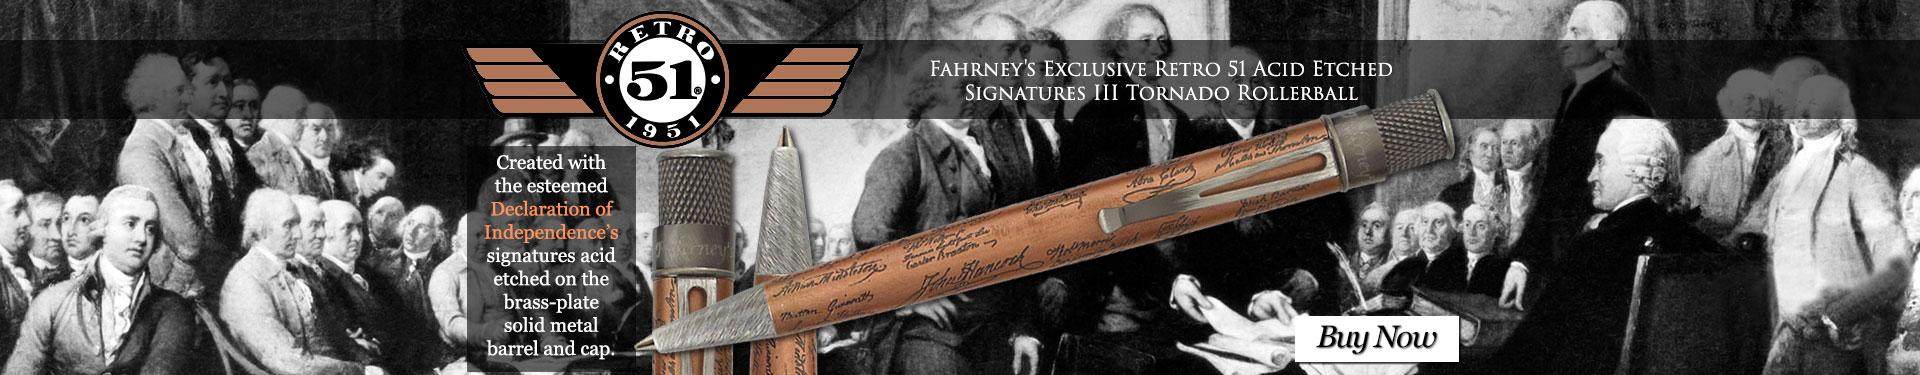 Fahrney's Exclusive Retro 51 Acid Etched Signatures III Tornado Rollerball